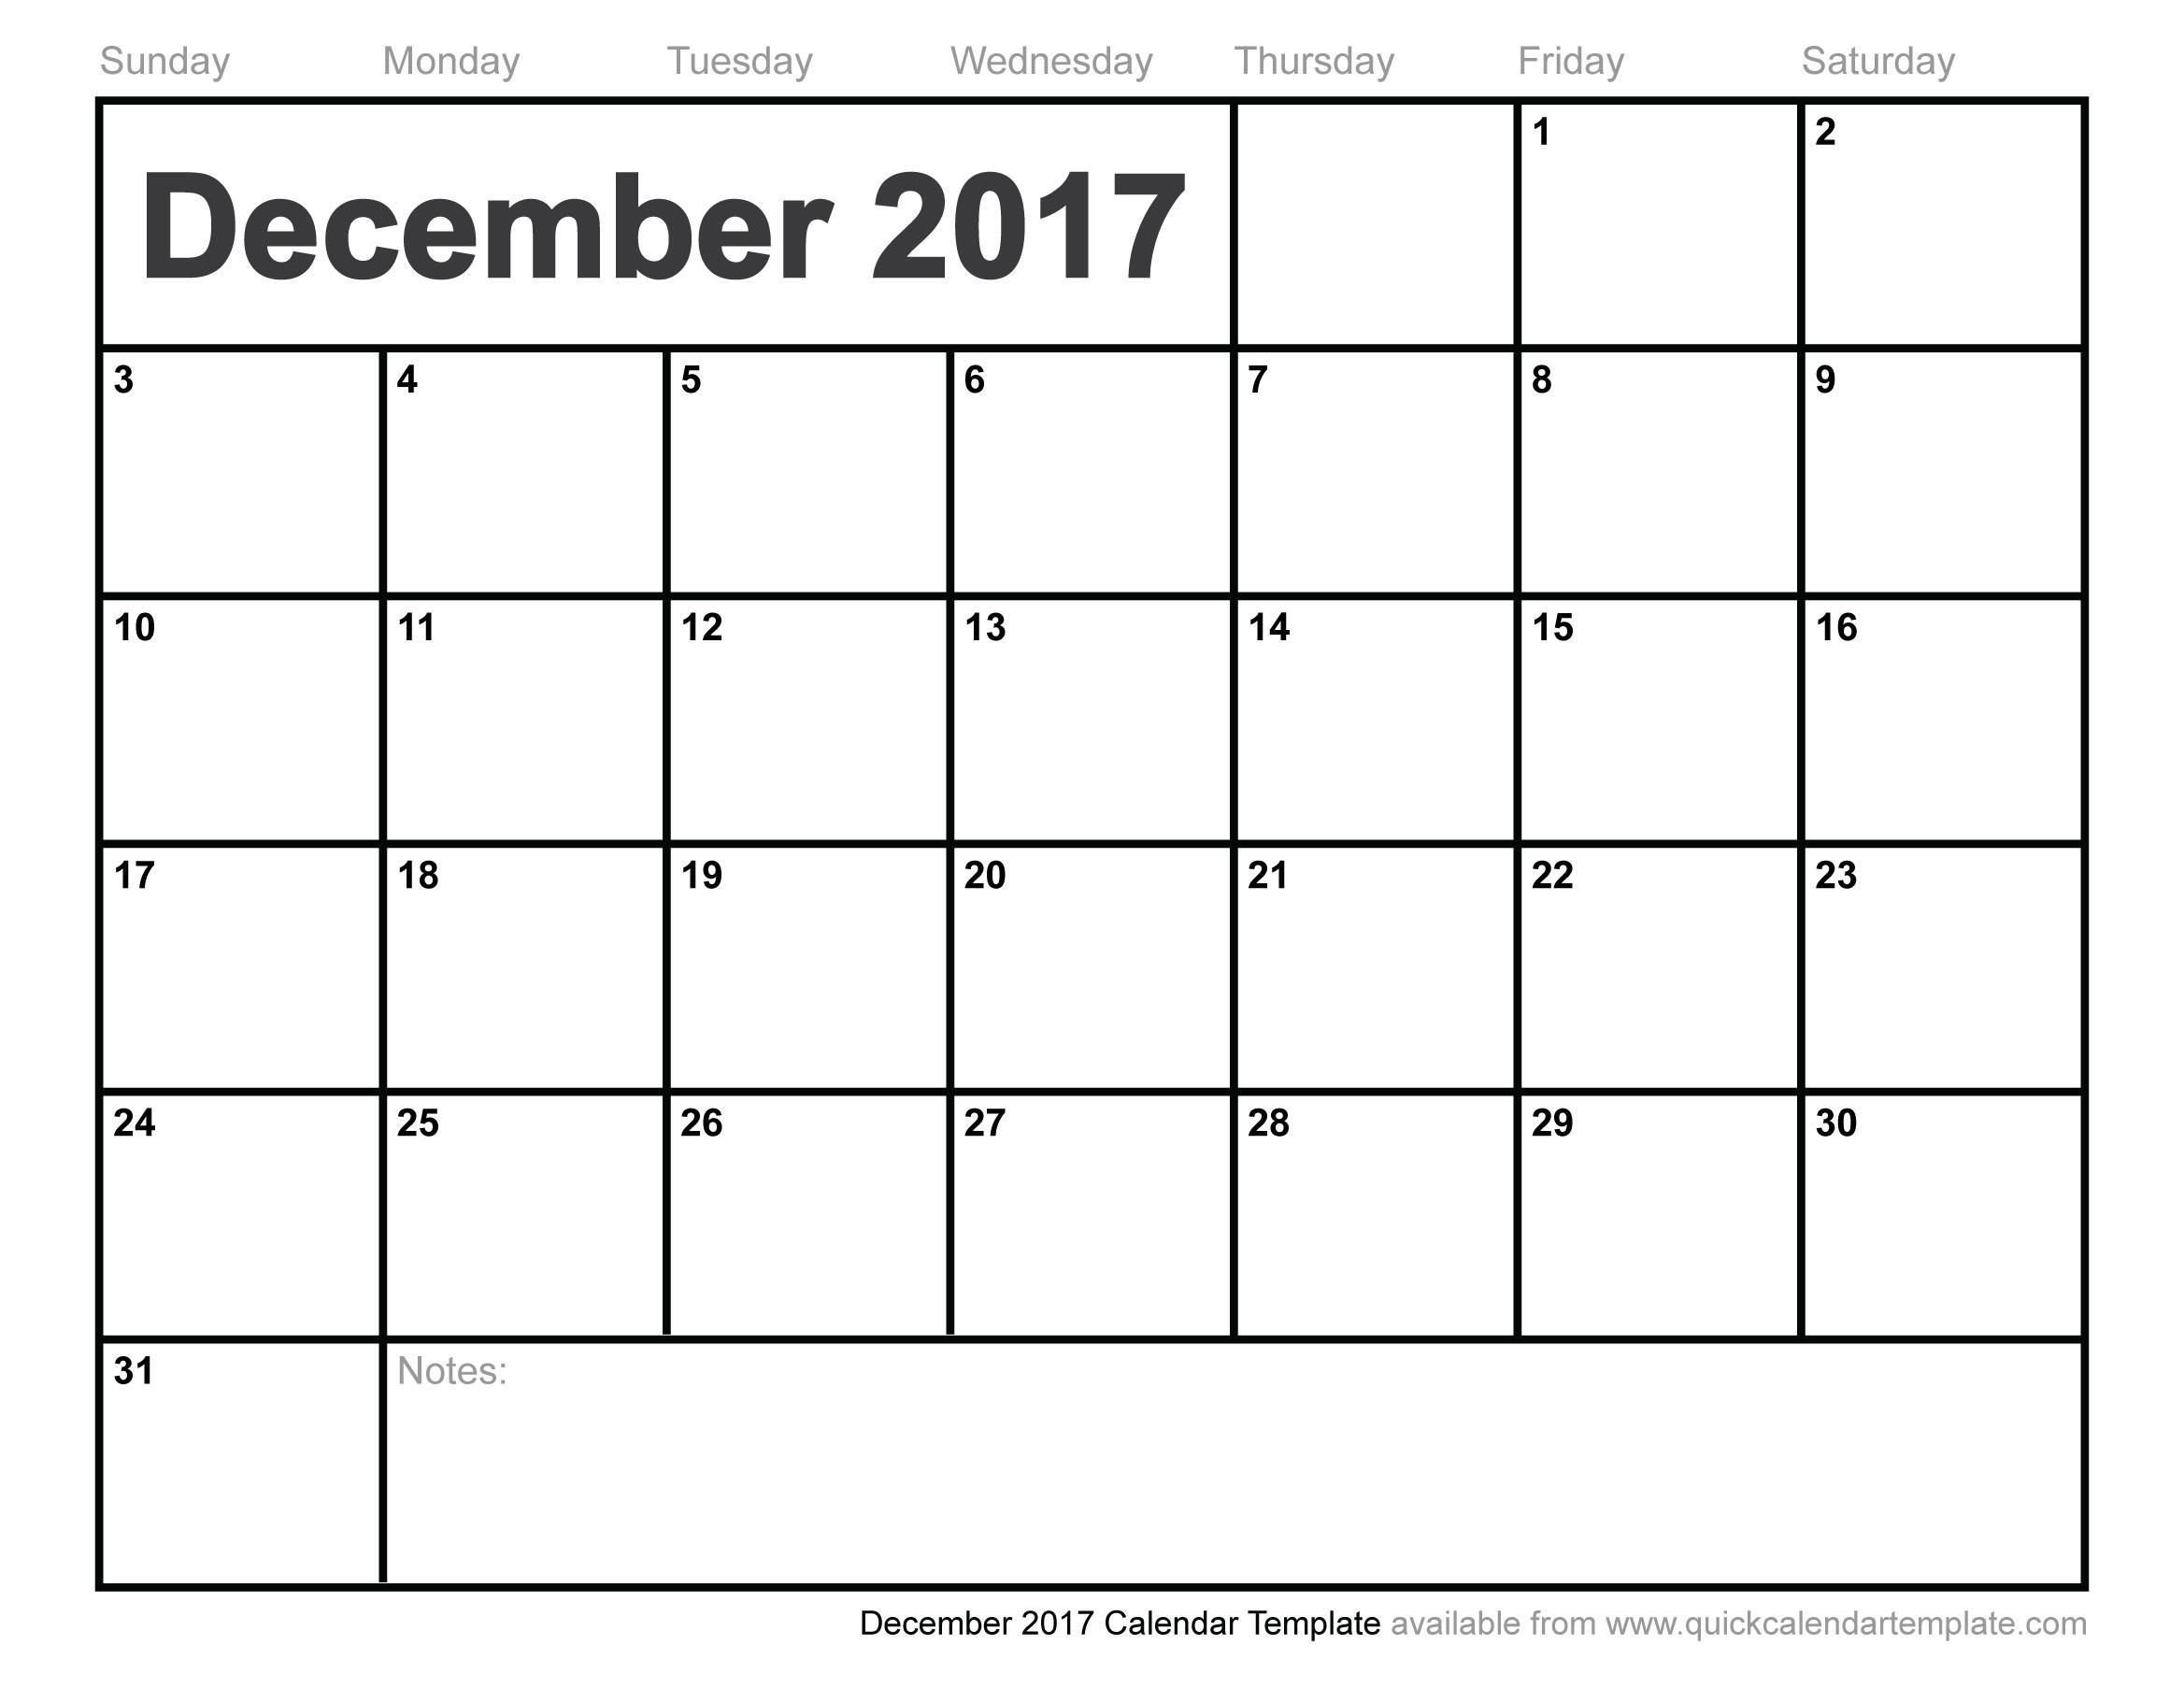 Free December Calendar Printable Templates With Holidays